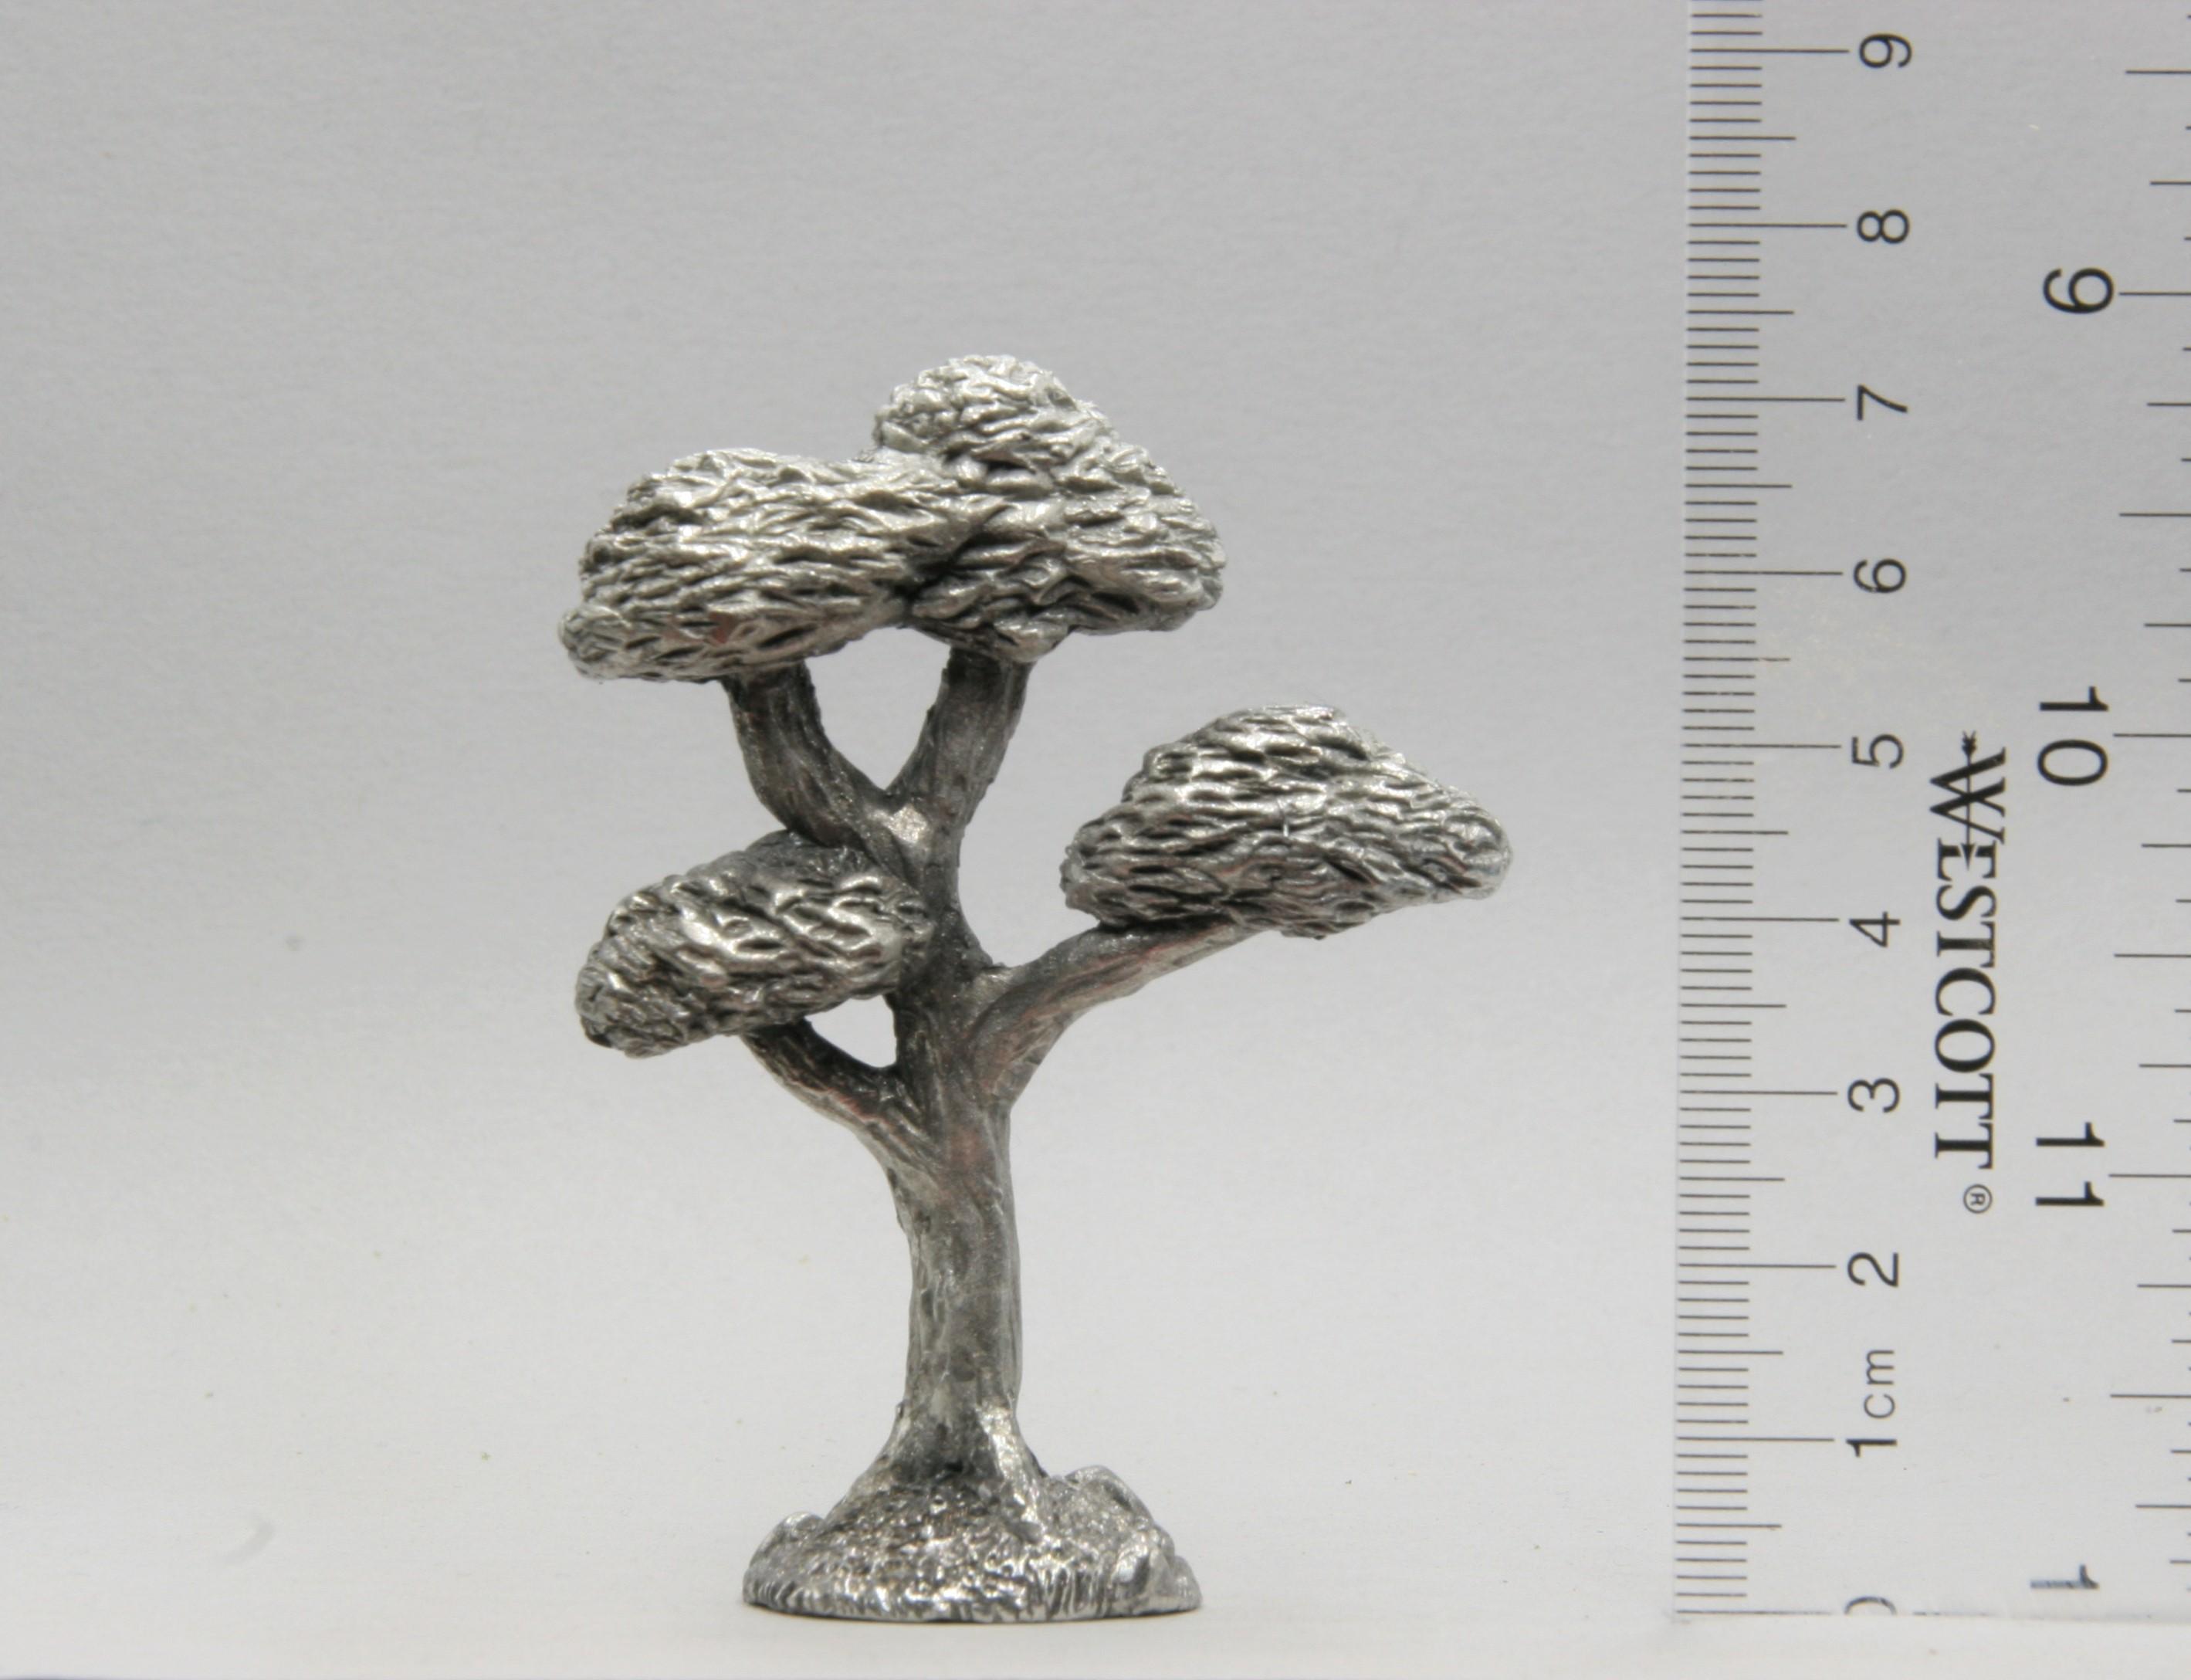 Tall Tree pewter